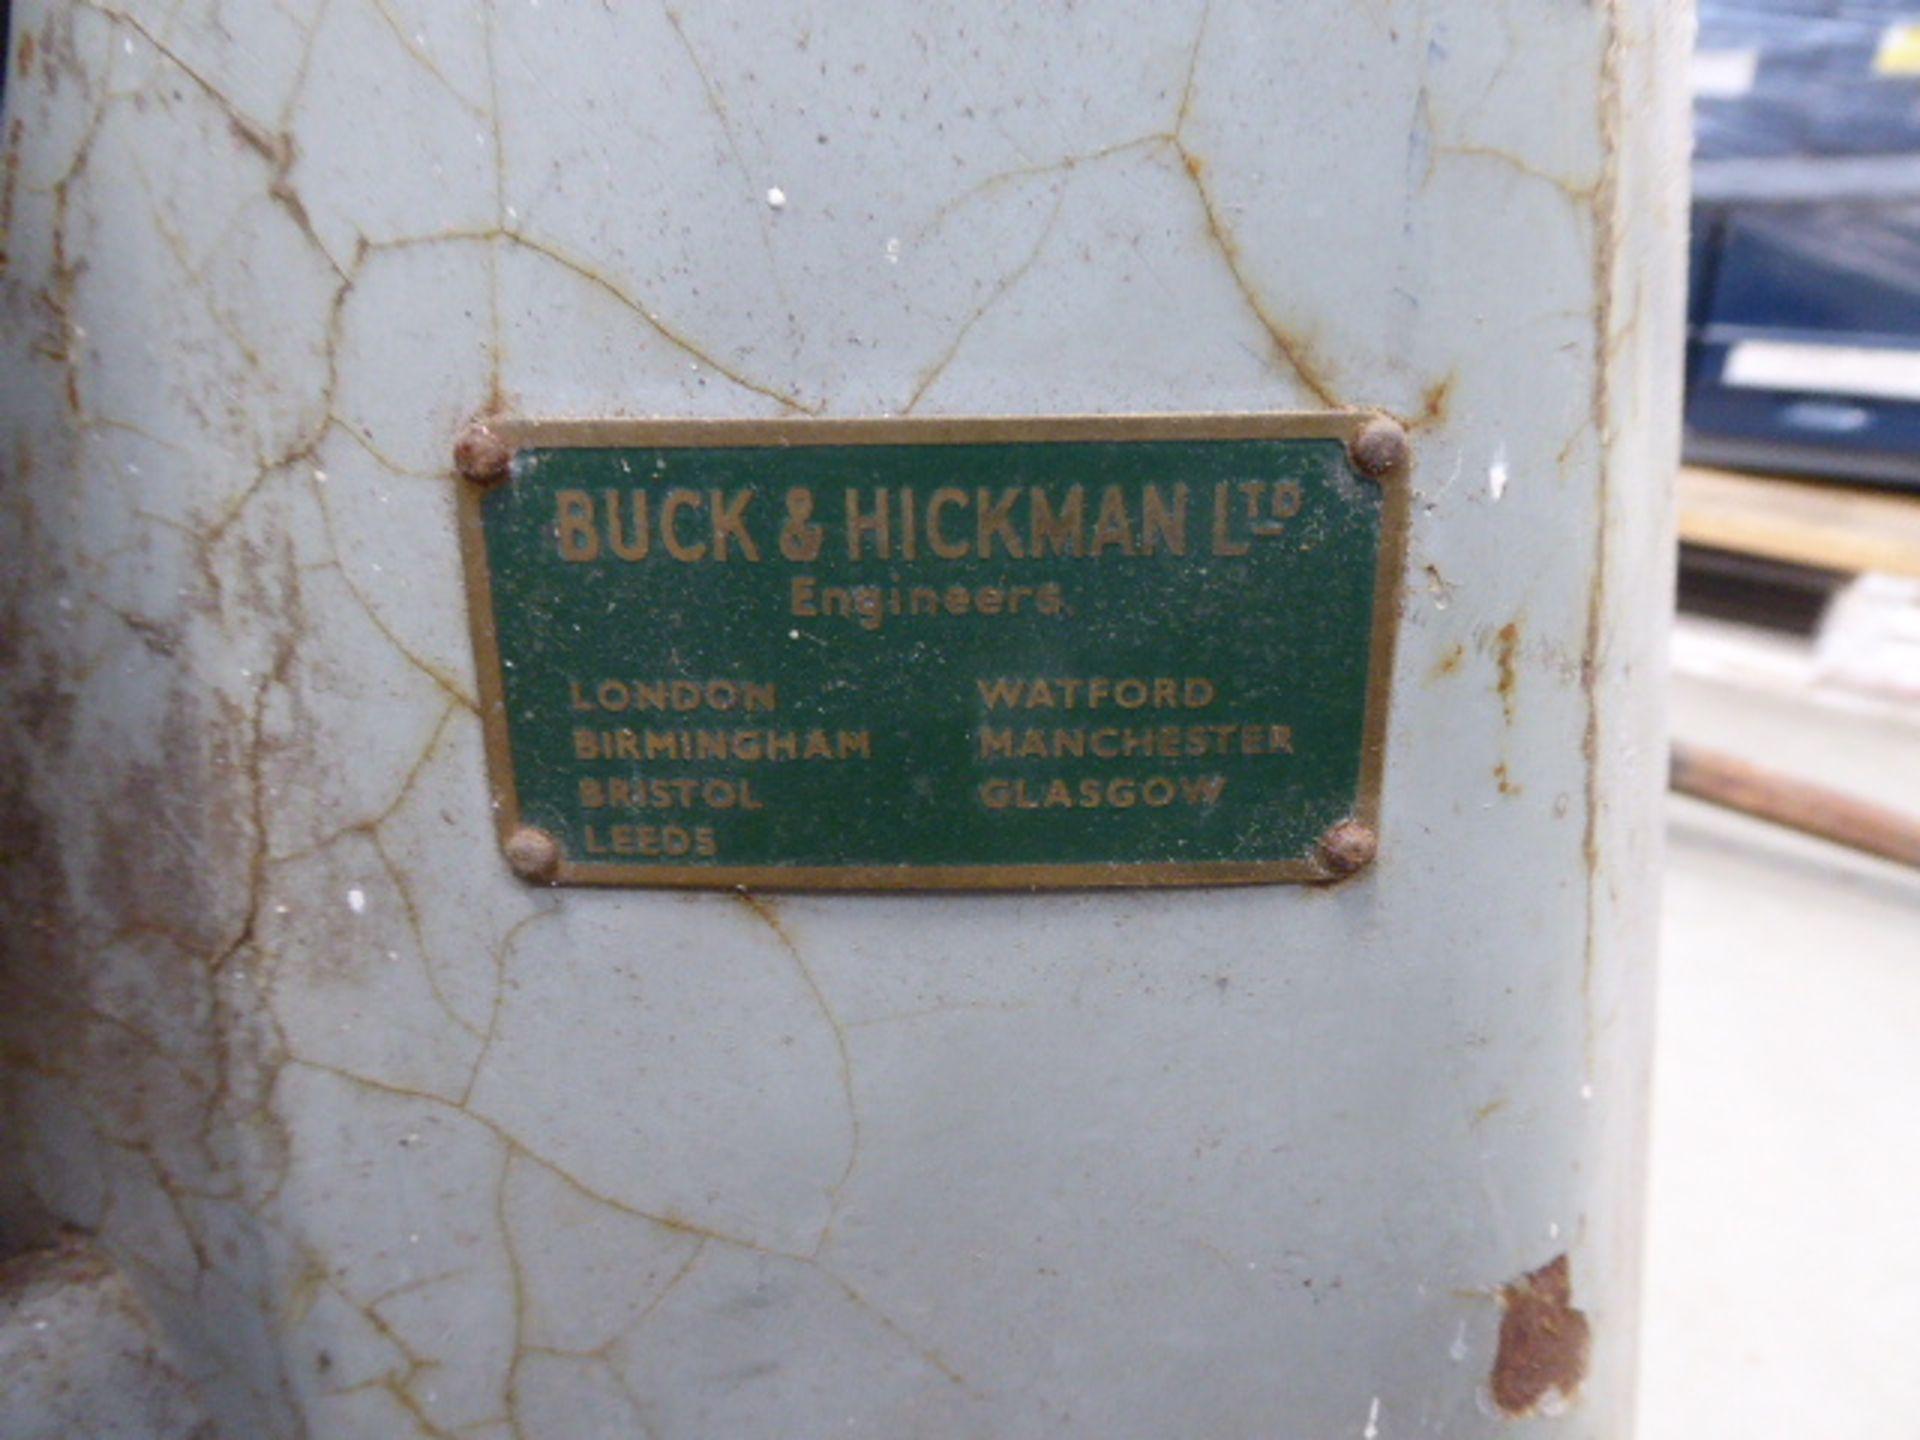 Buck & Hickman press - Image 2 of 2